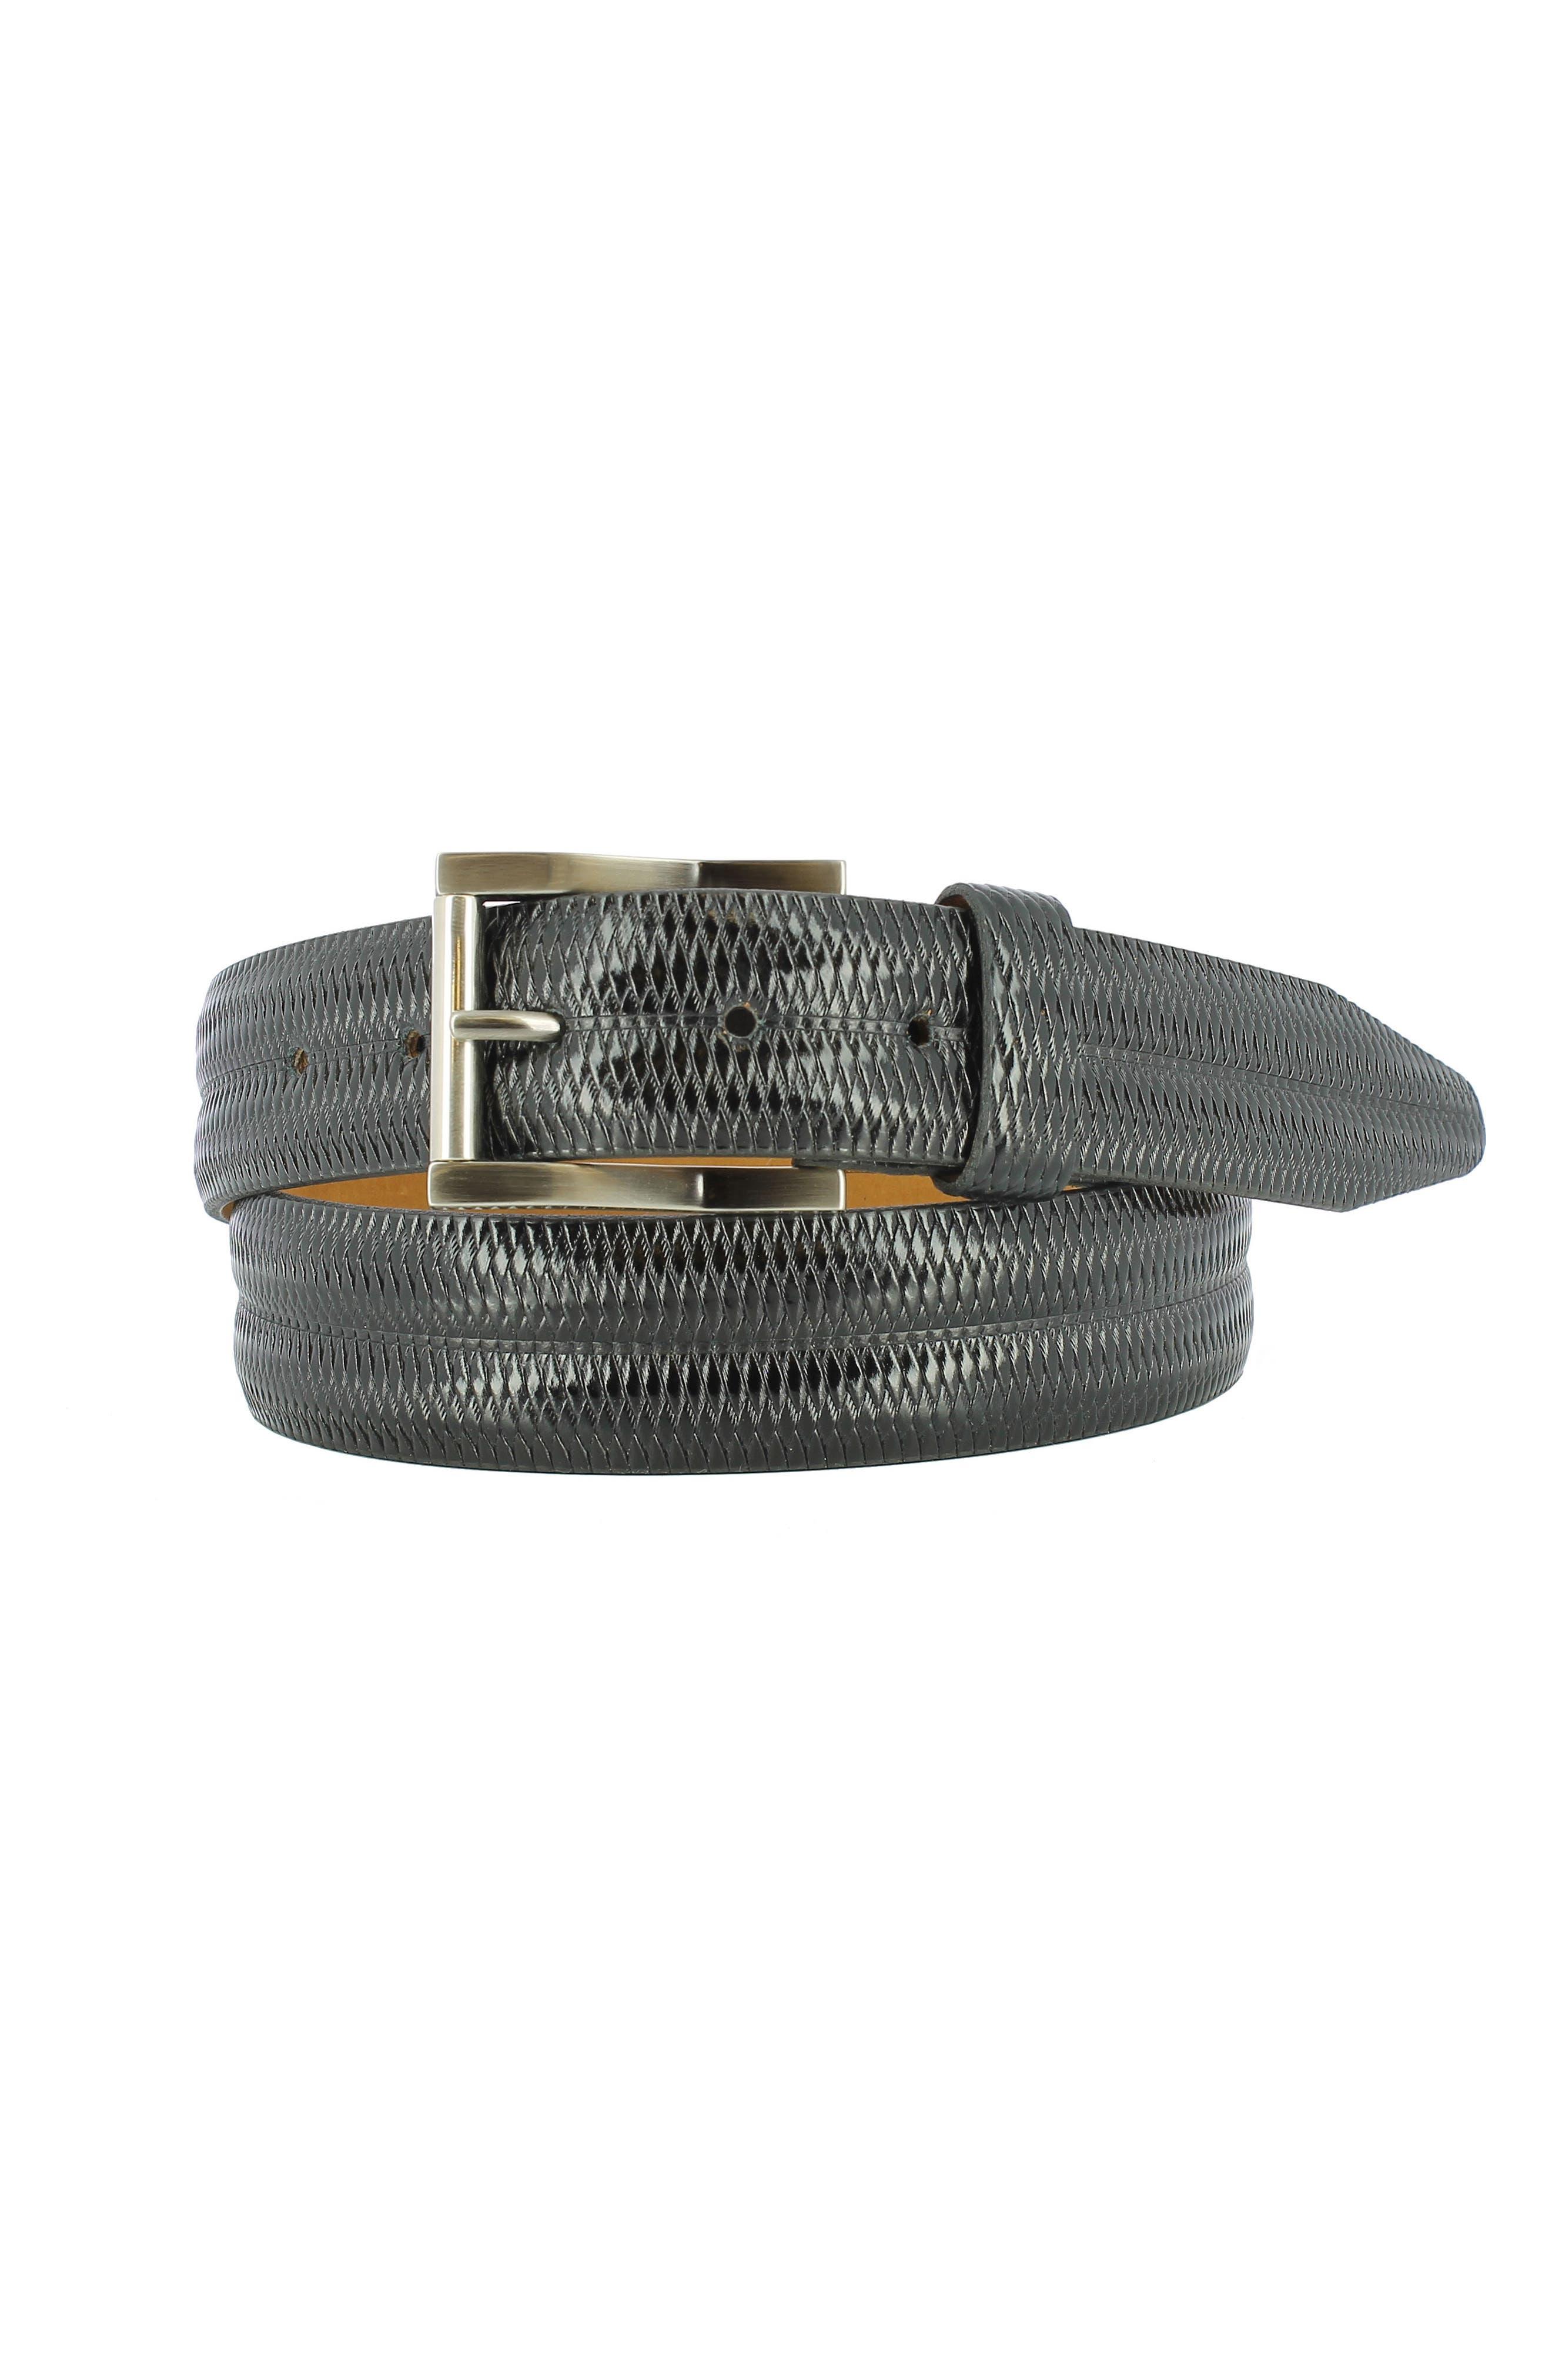 Lux Leather Belt,                         Main,                         color, Black